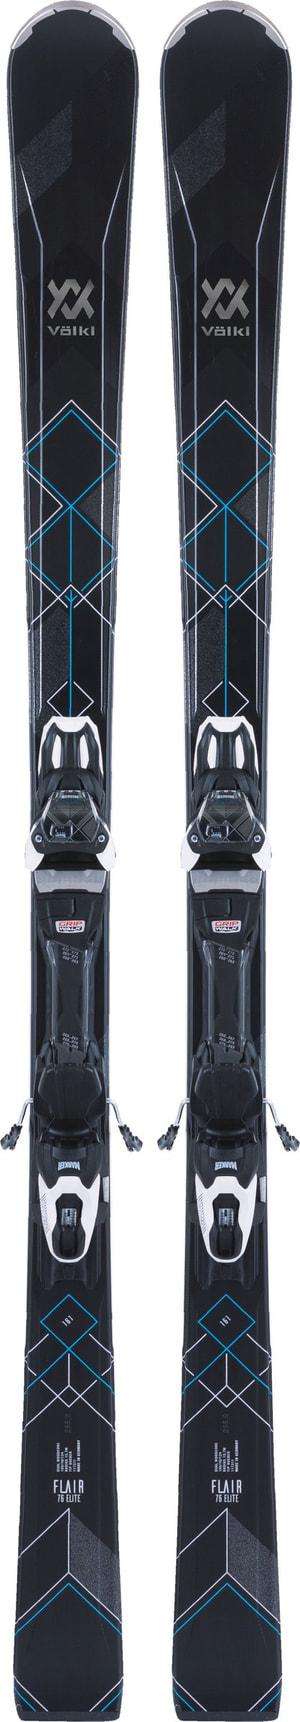 Flair 76 Elite inkl. vMotion 10